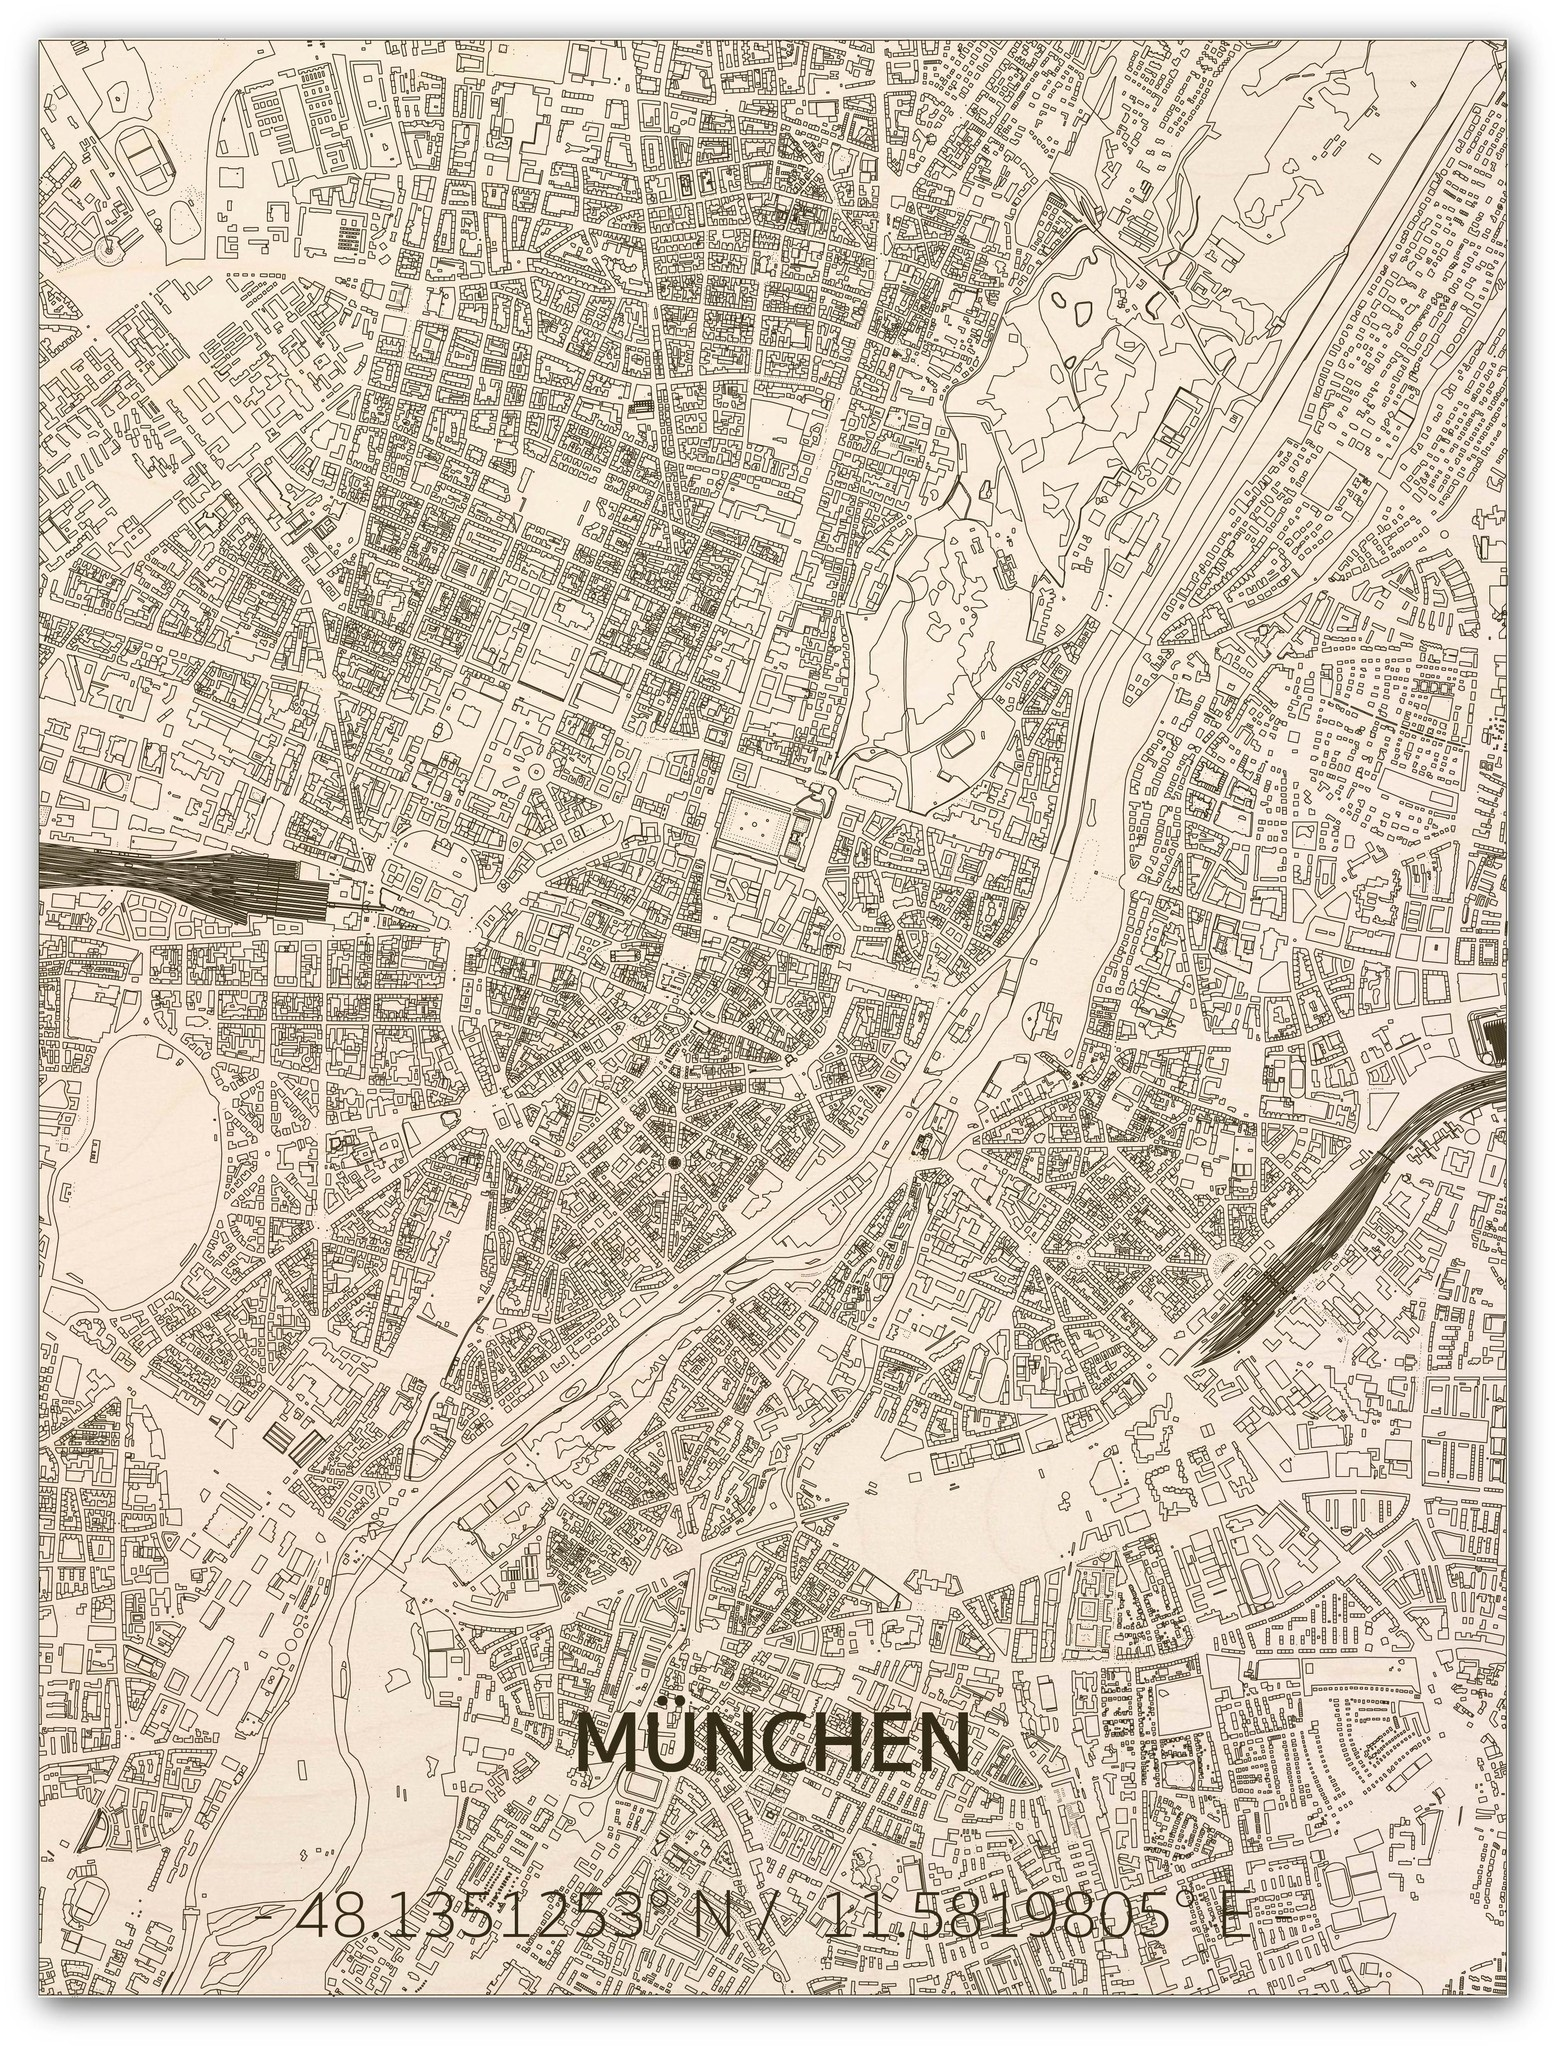 Wandbild Stadtplan München | Wanddekoration Holz-1